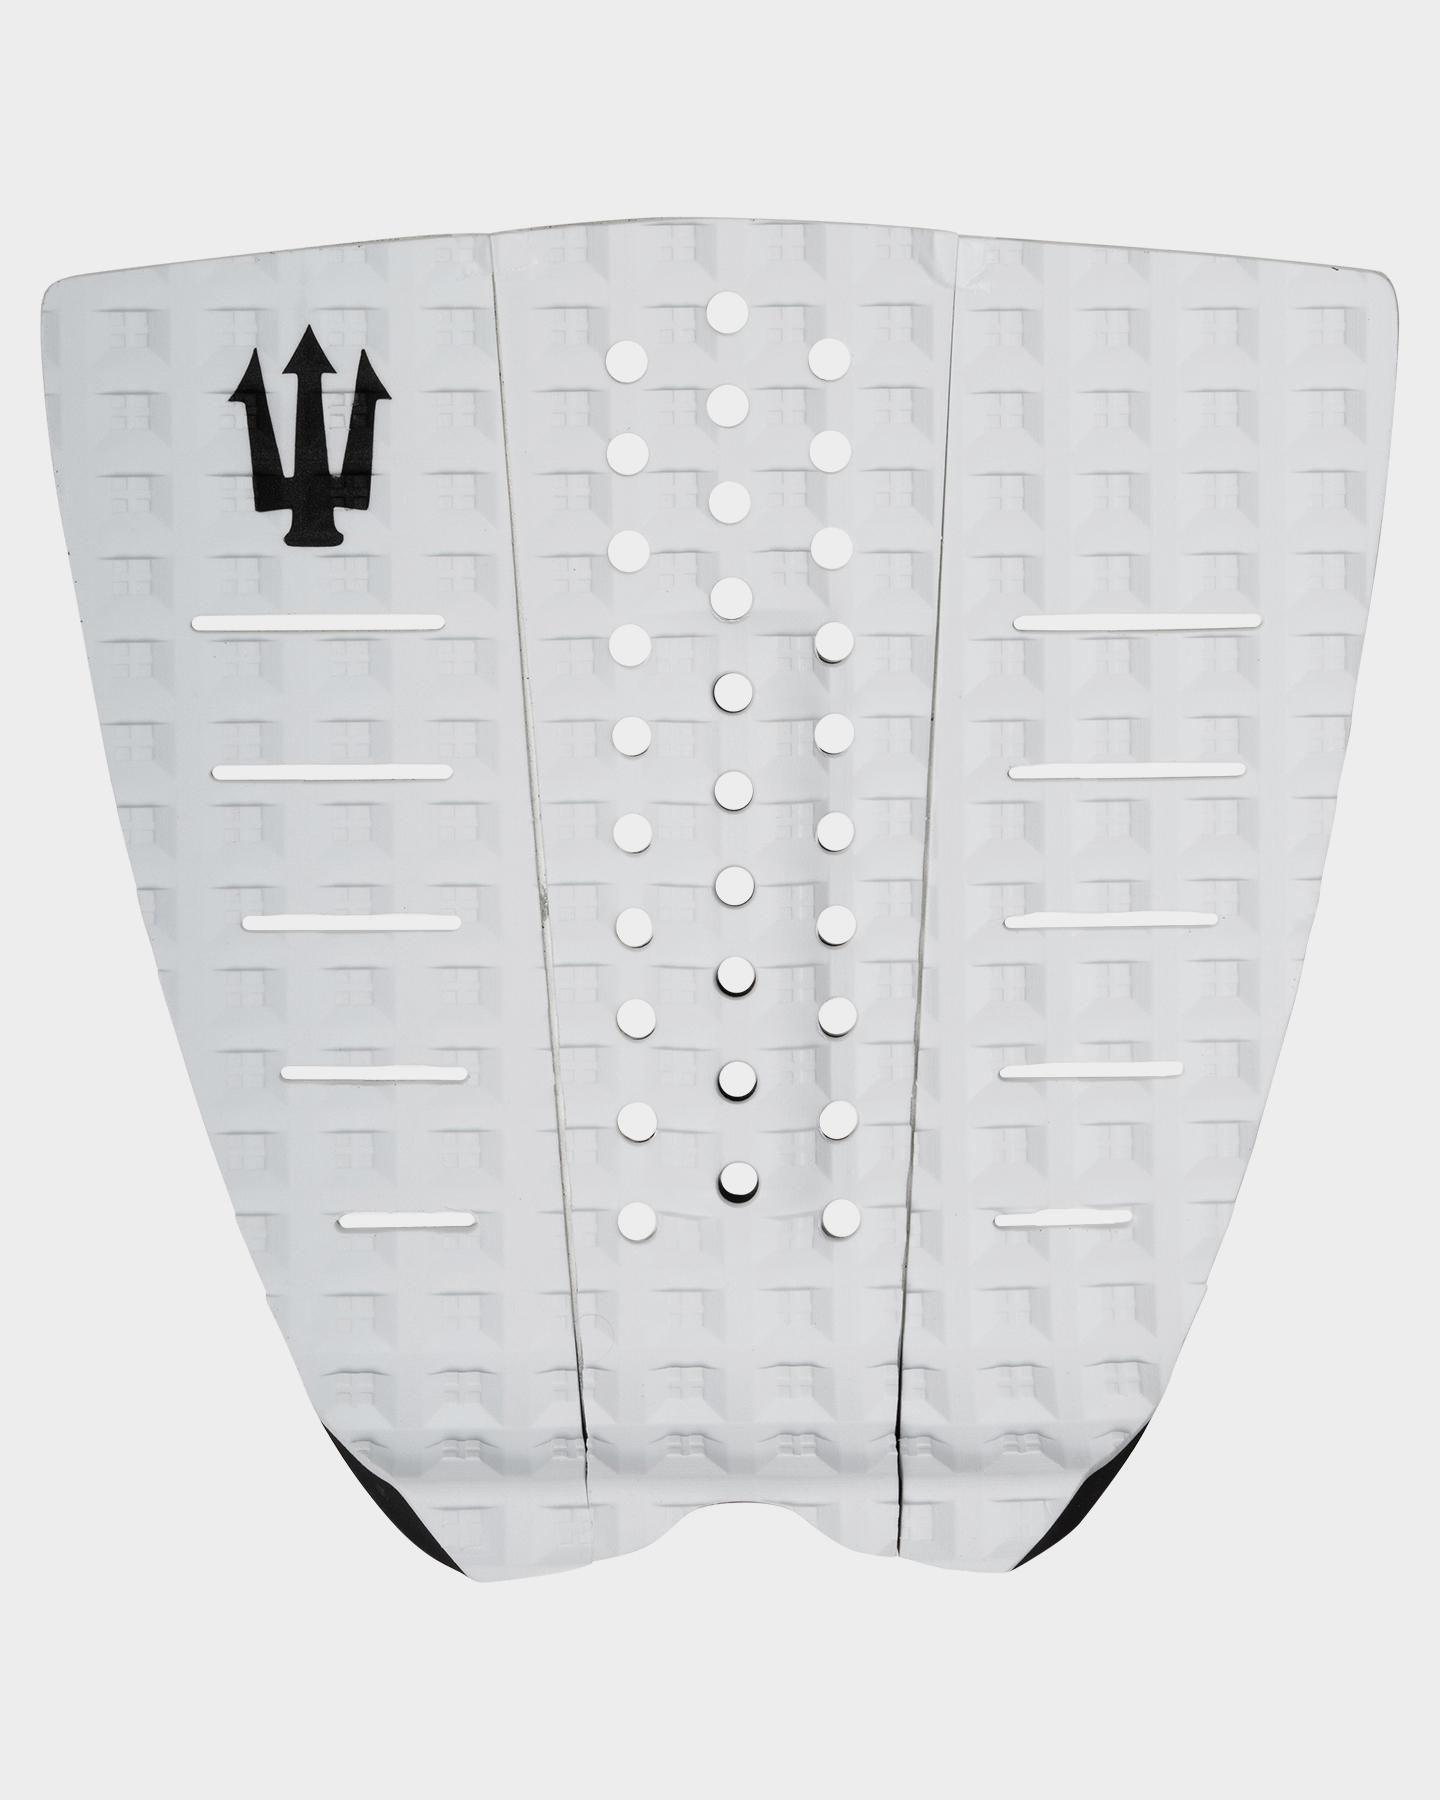 Fk Surf Atomic Tail Pad All White Black